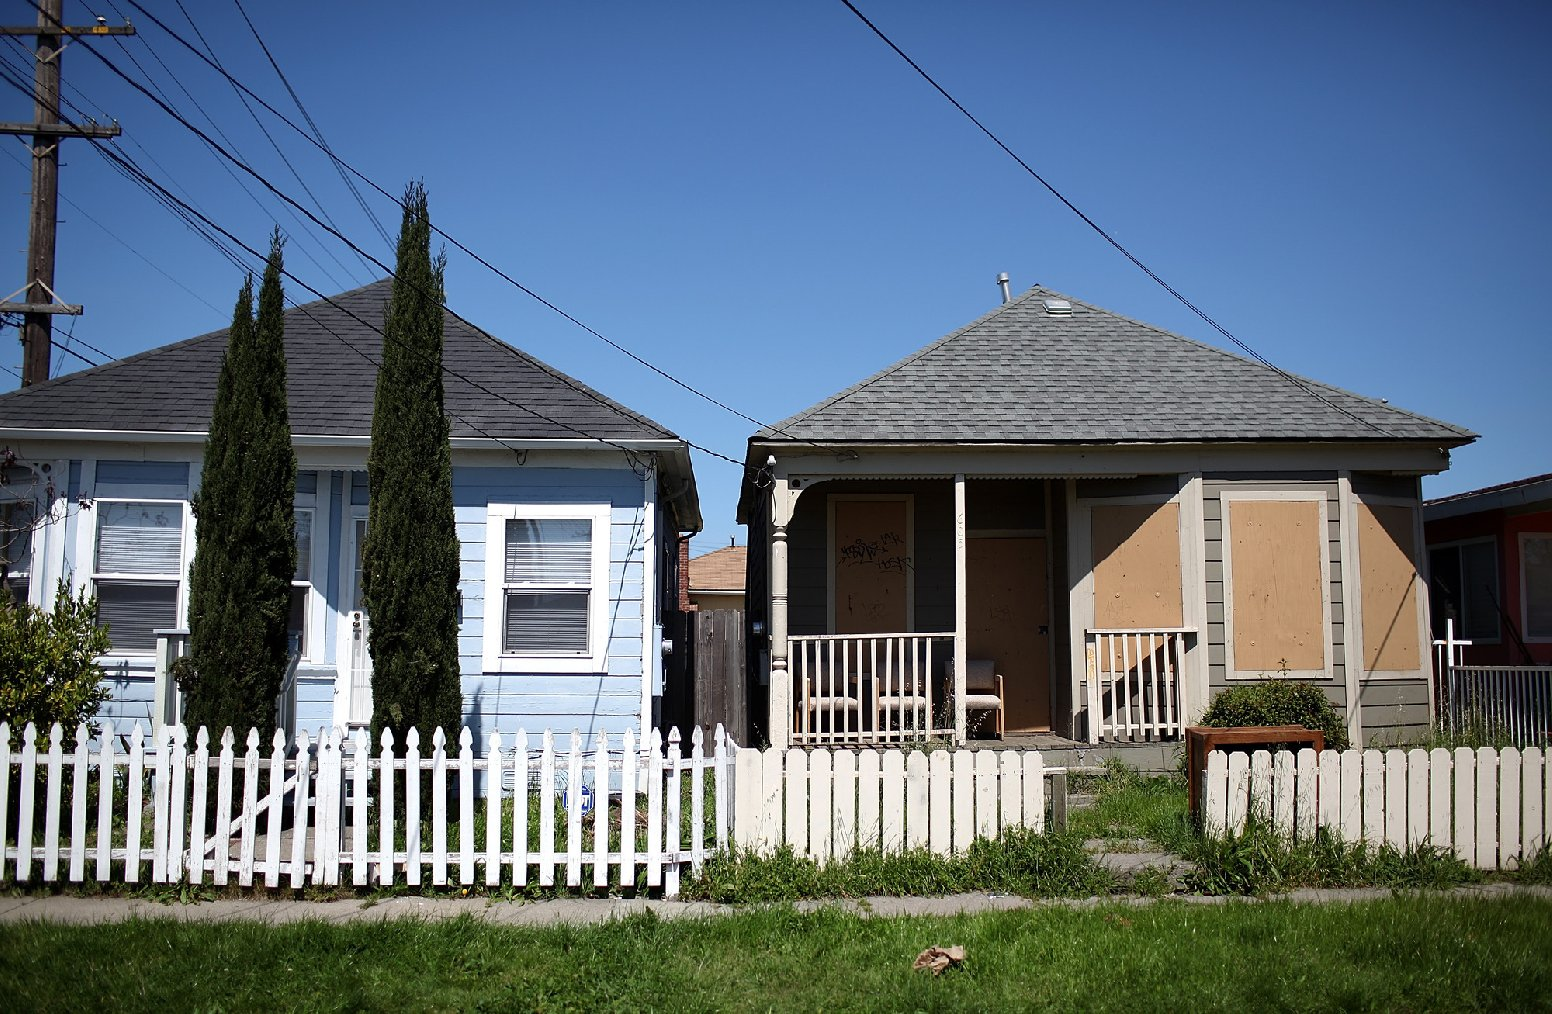 Homes in Richmond, California. (Justin Sullivan/Getty Images)